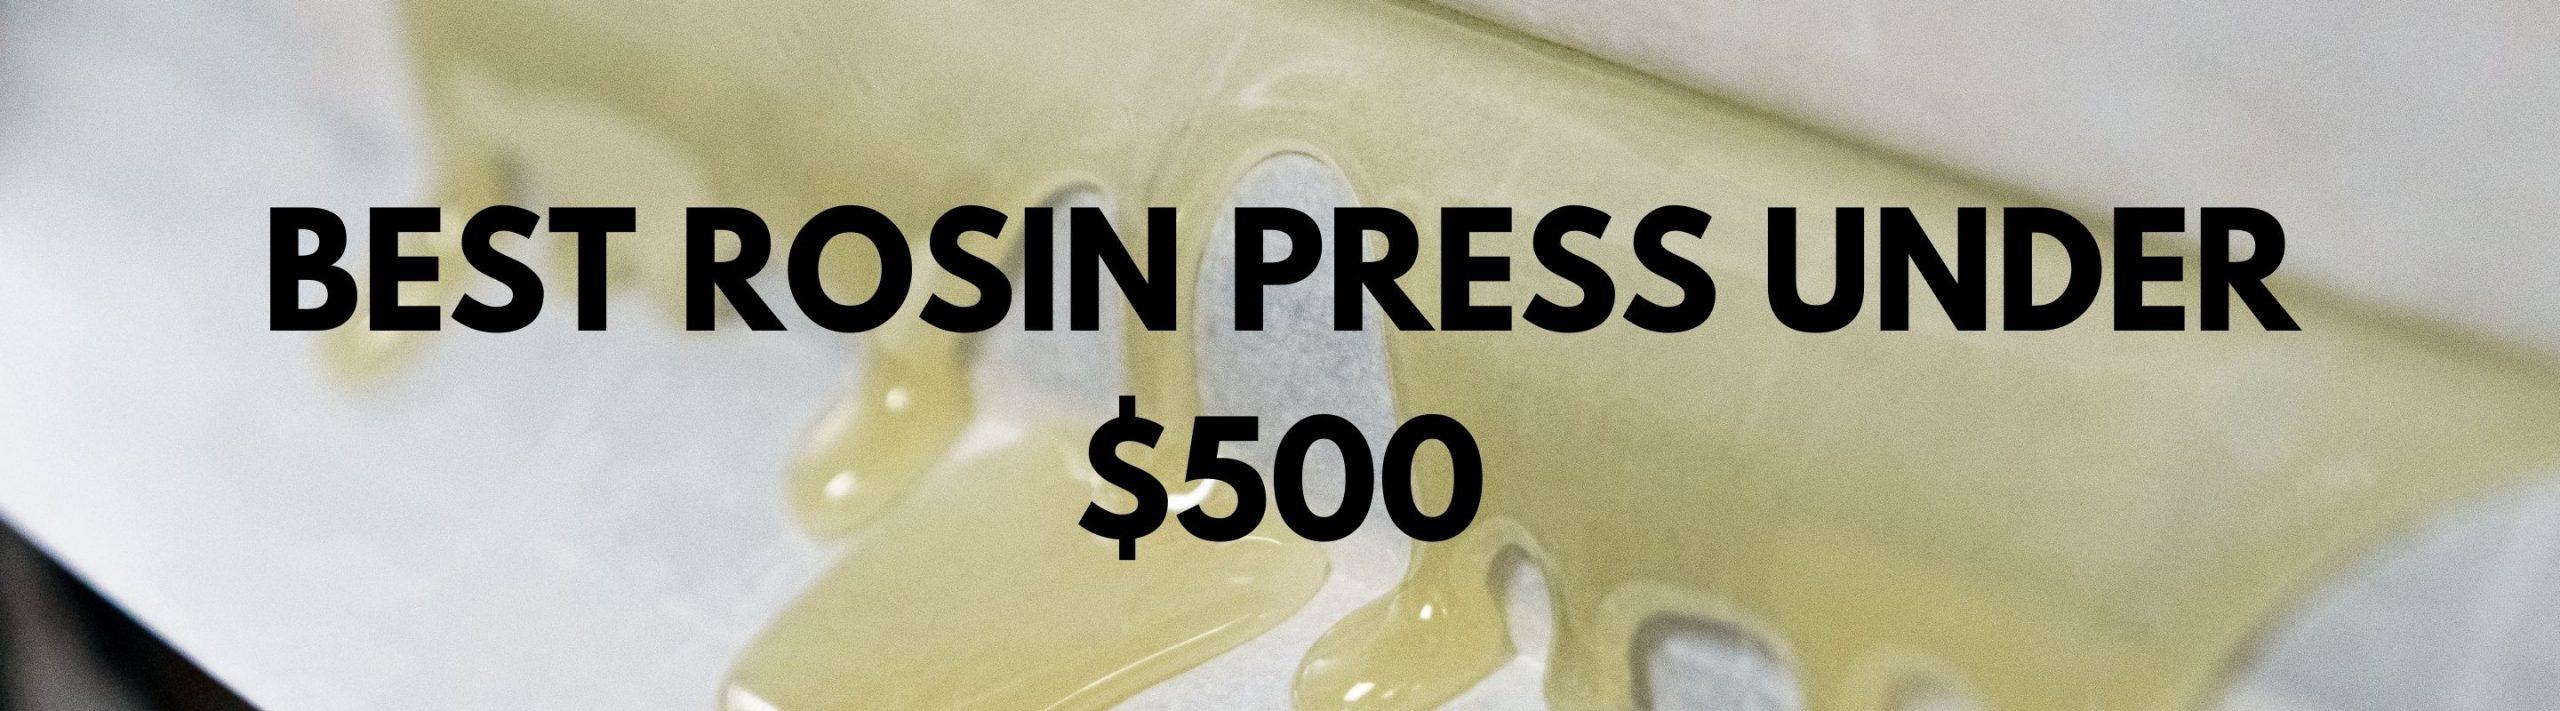 Best rosin press under 500